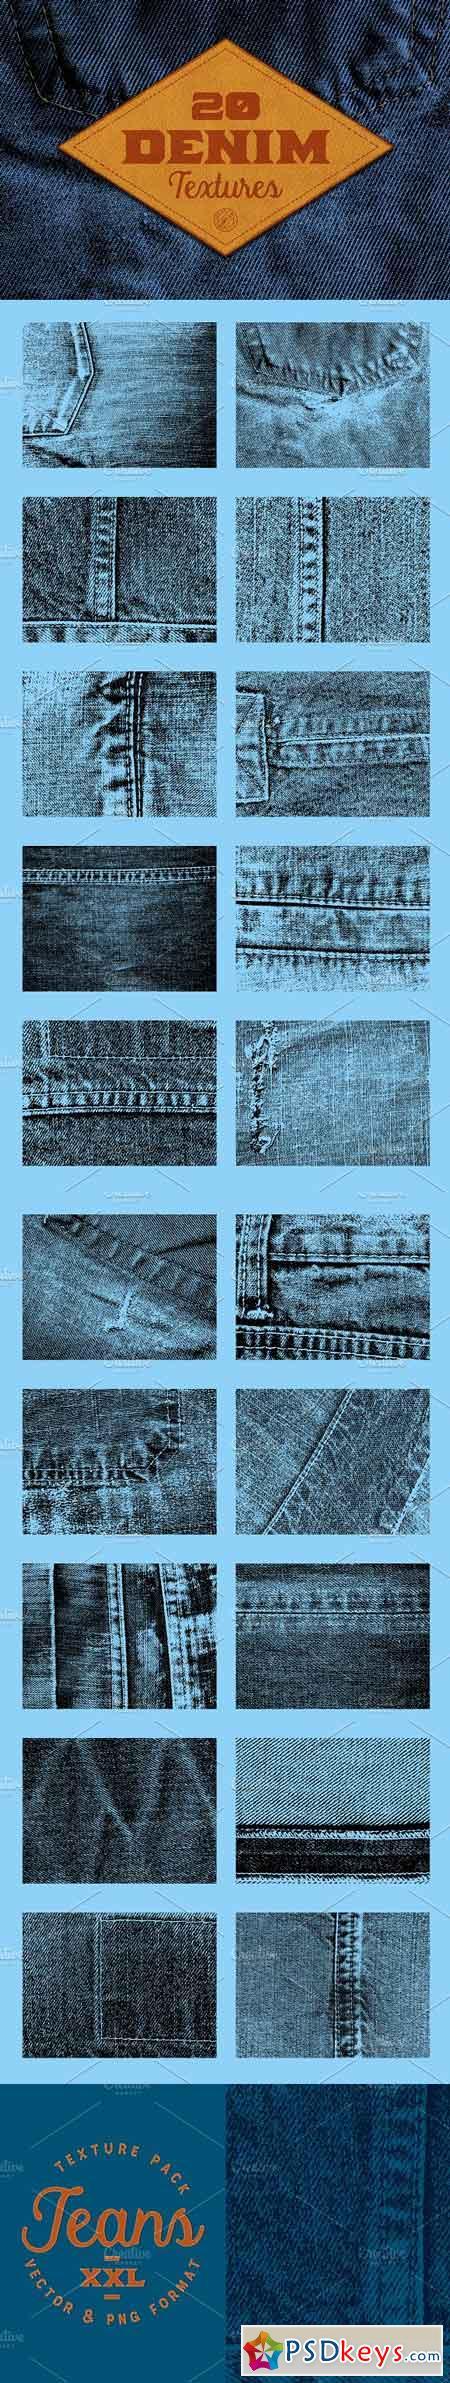 20 Denim Textures 118449